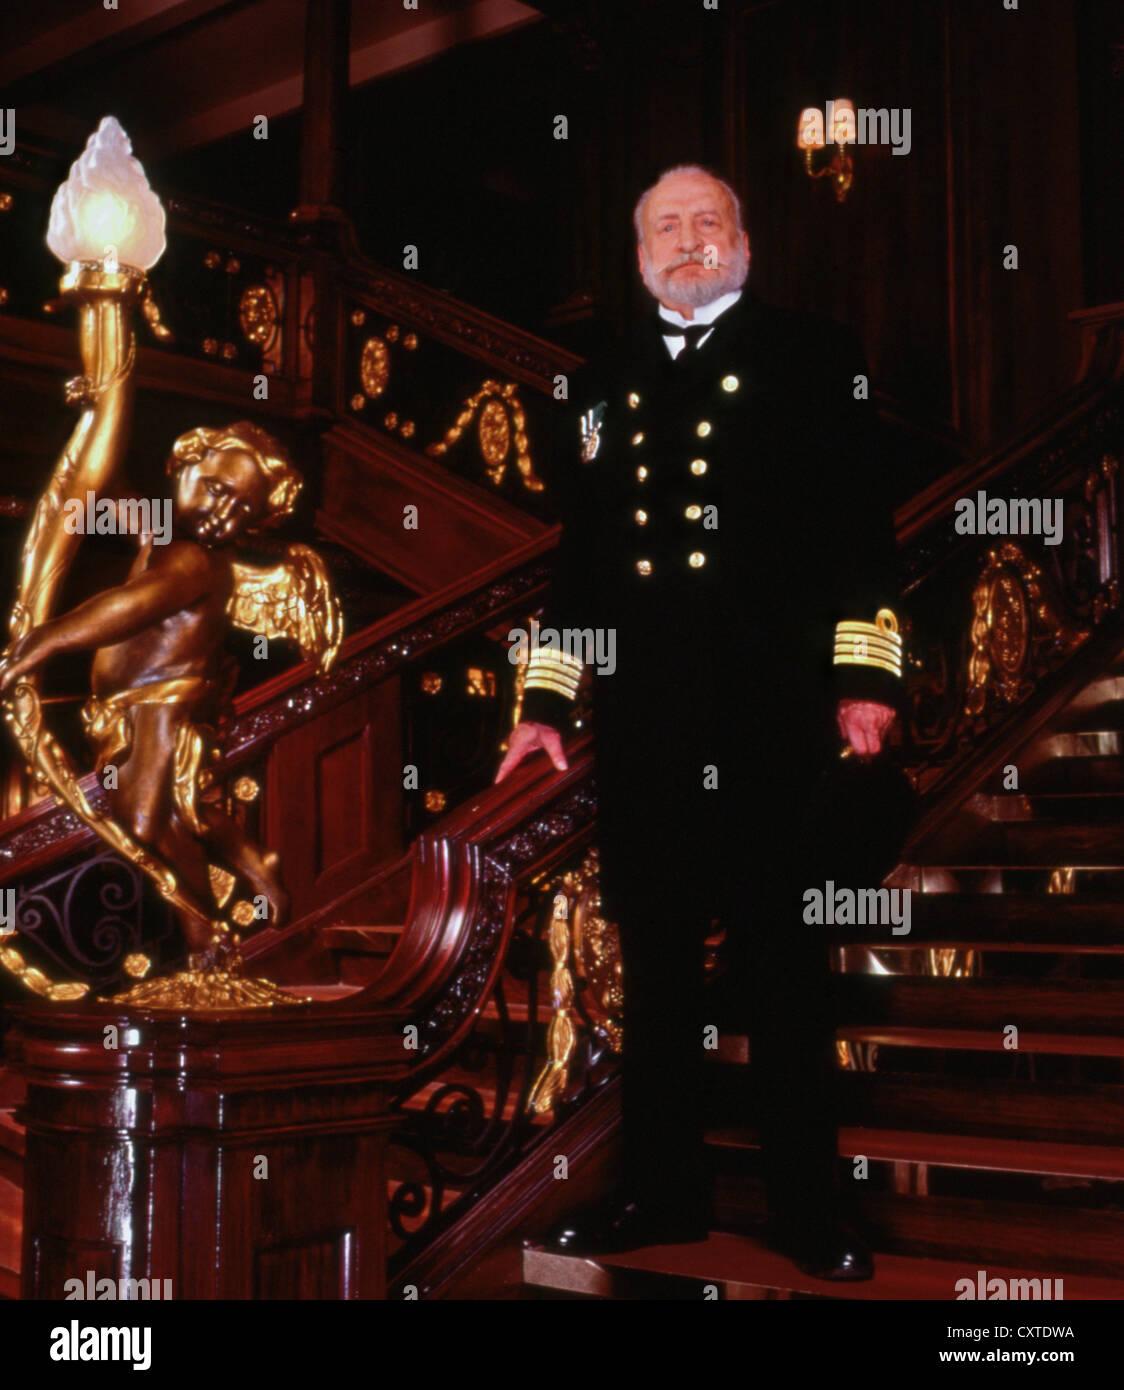 TITANIC (1996) GEORGE C SCOTT, ROBERT LIEBERMAN (DIR) TTNC 002 MOVIESTORE COLLECTION LTD - Stock Image